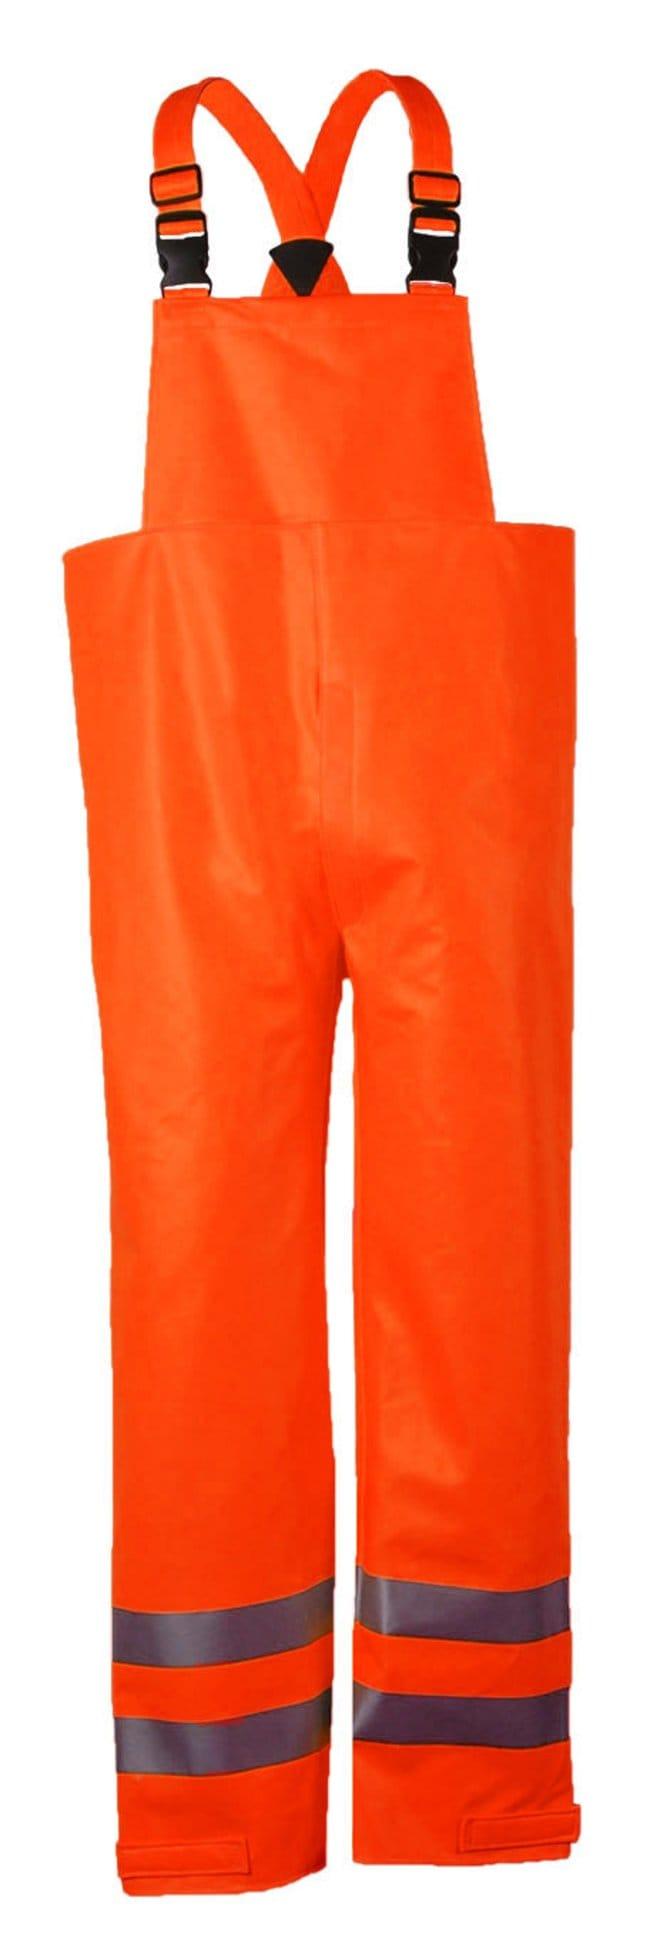 National Safety ApparelArc H2O FR Hi-Vis Orange Bib Overall - Class E Tall:Personal